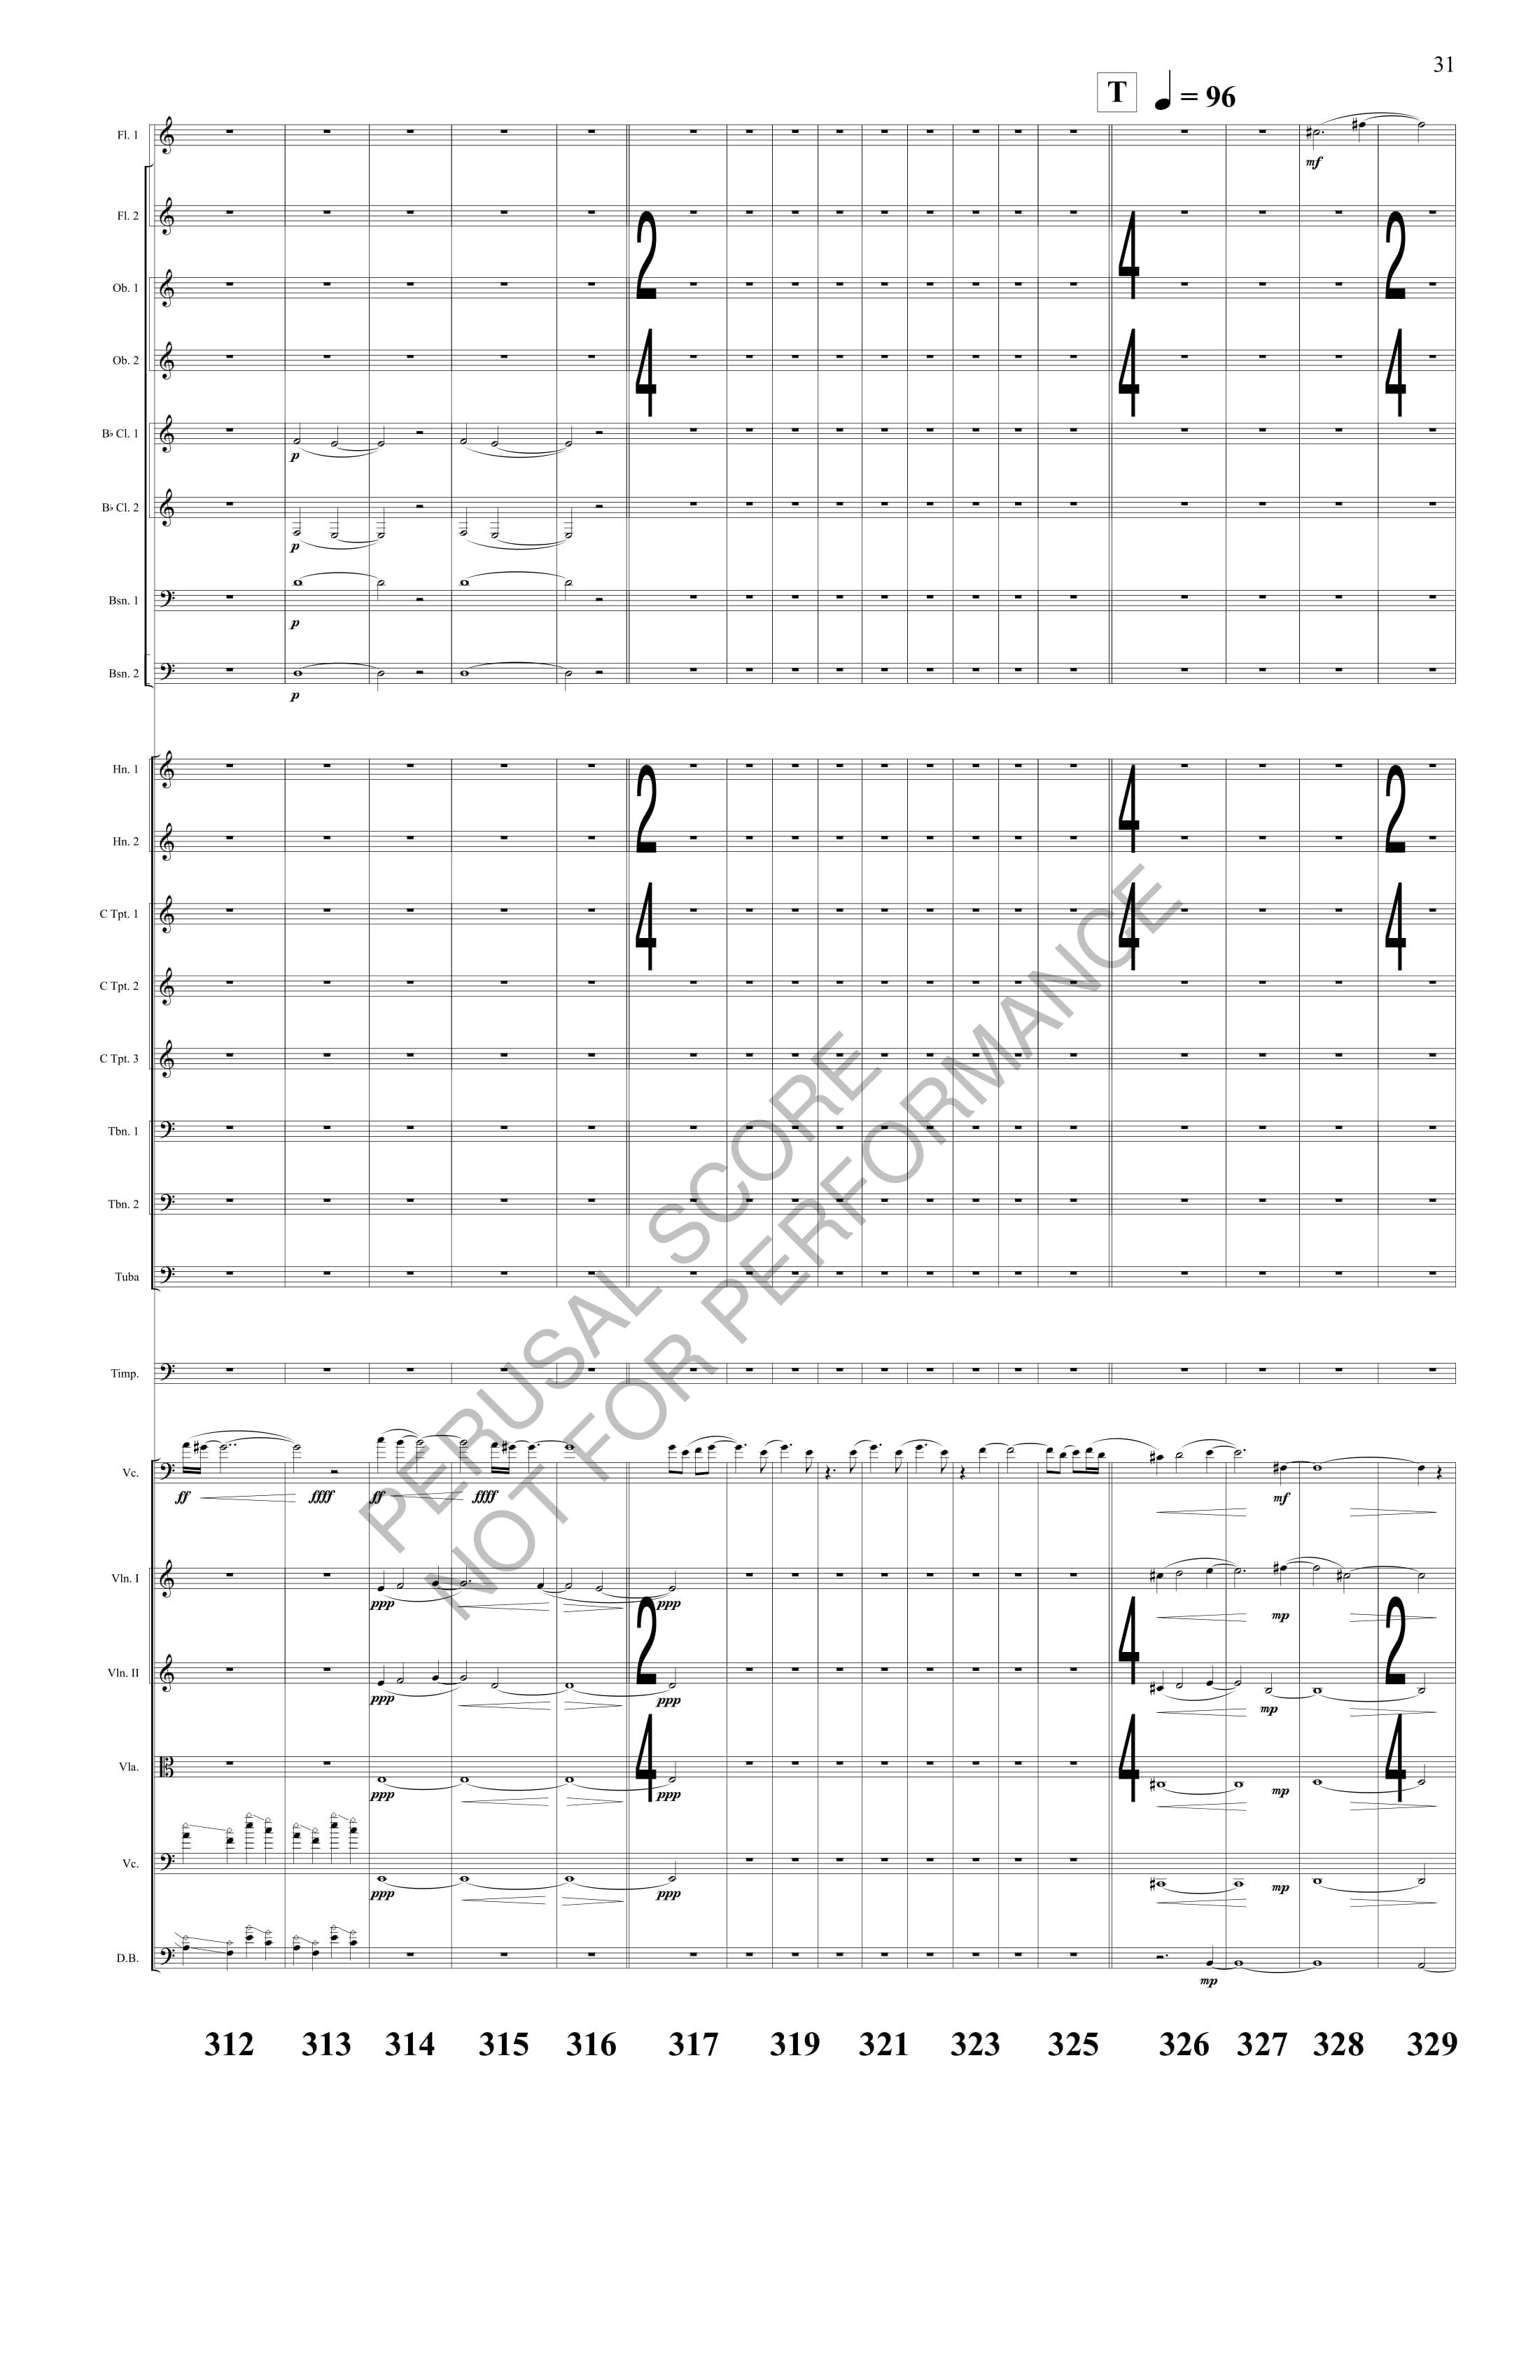 Boyd Tekton Score-watermark-37.jpg